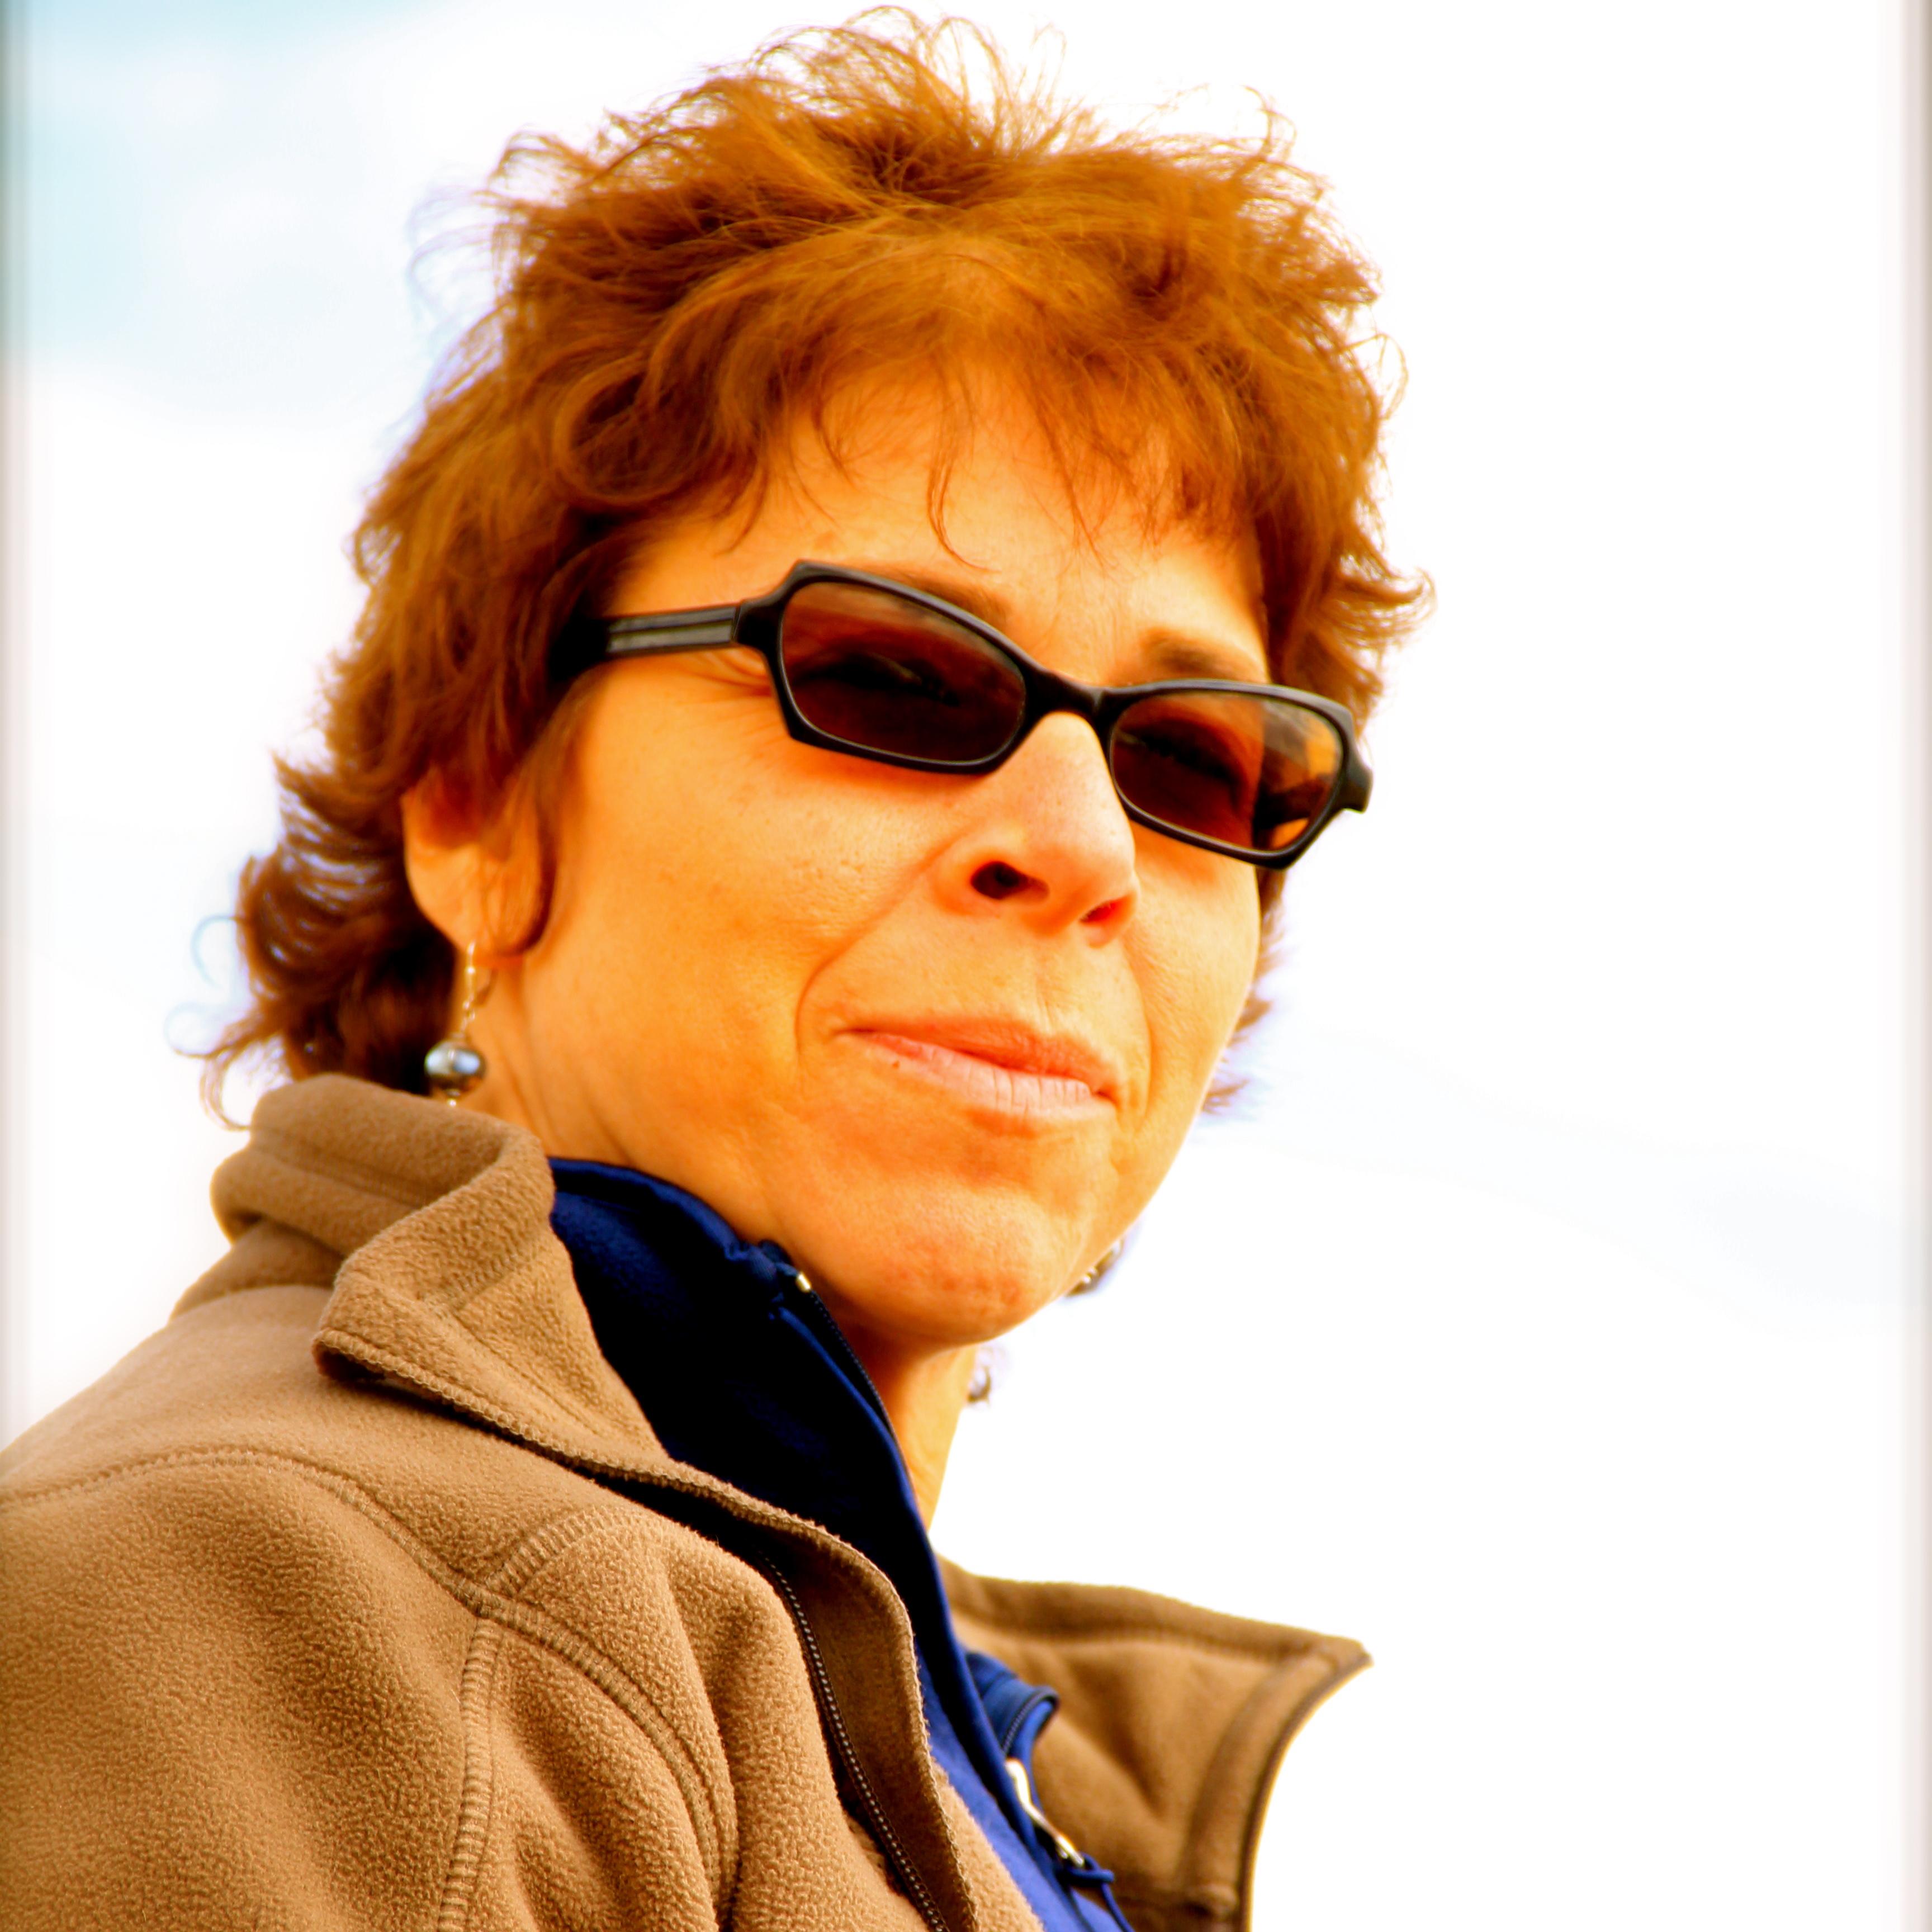 Lisa D. Olken